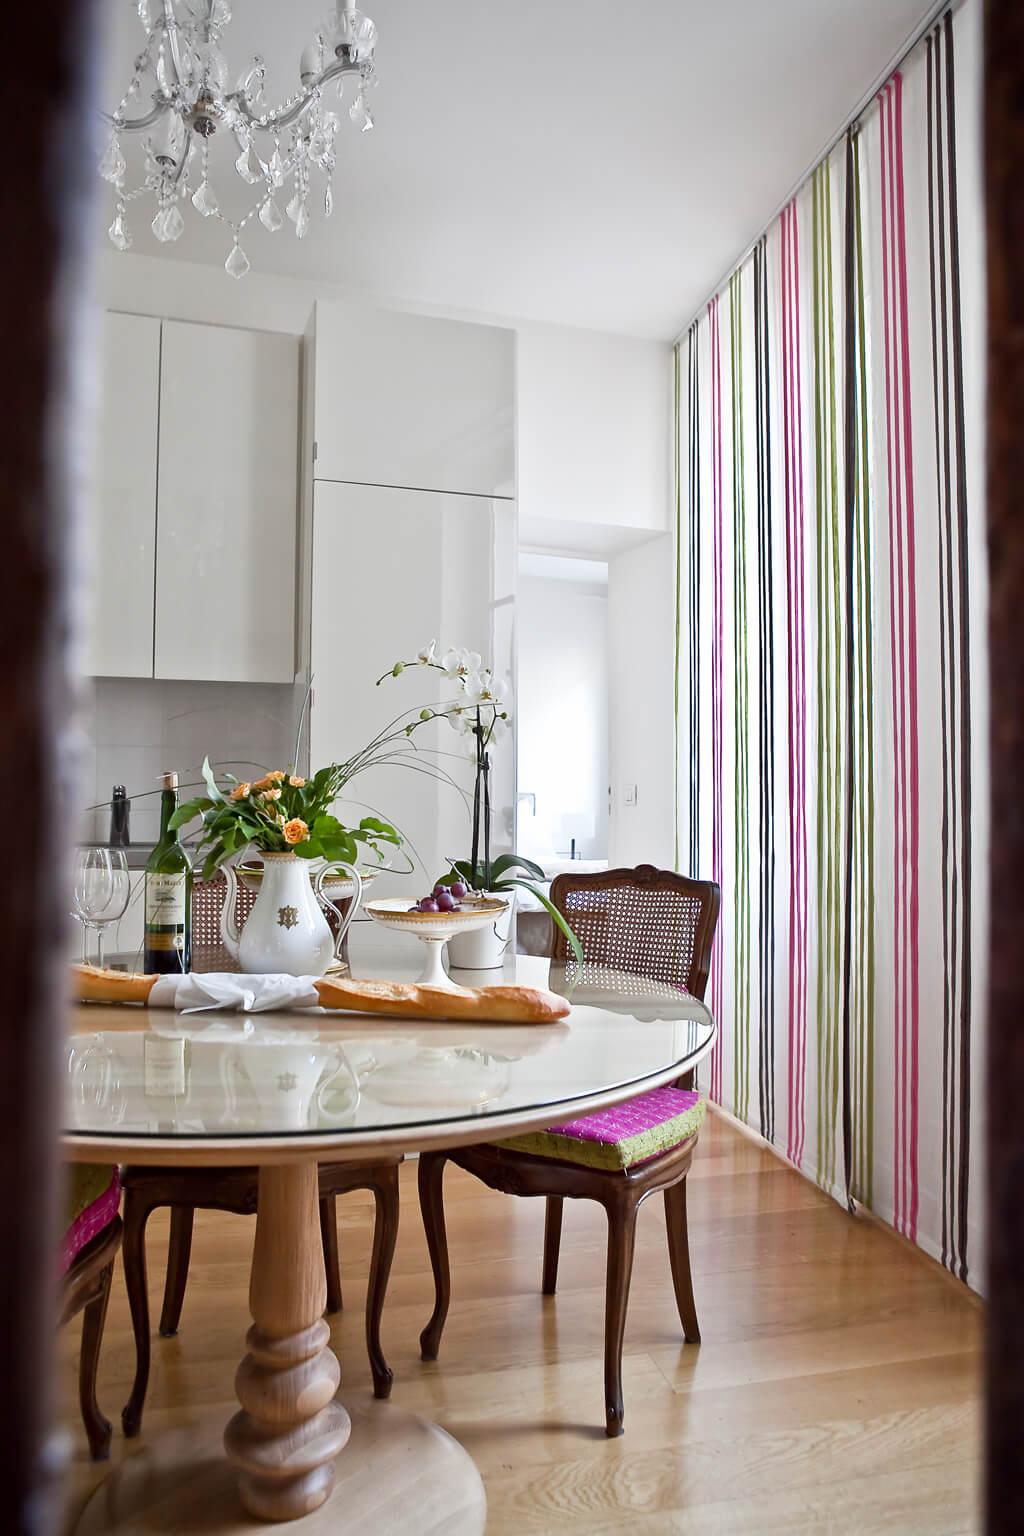 Paris Luxury Apartment Rental | St Germain Luxe | Haven in